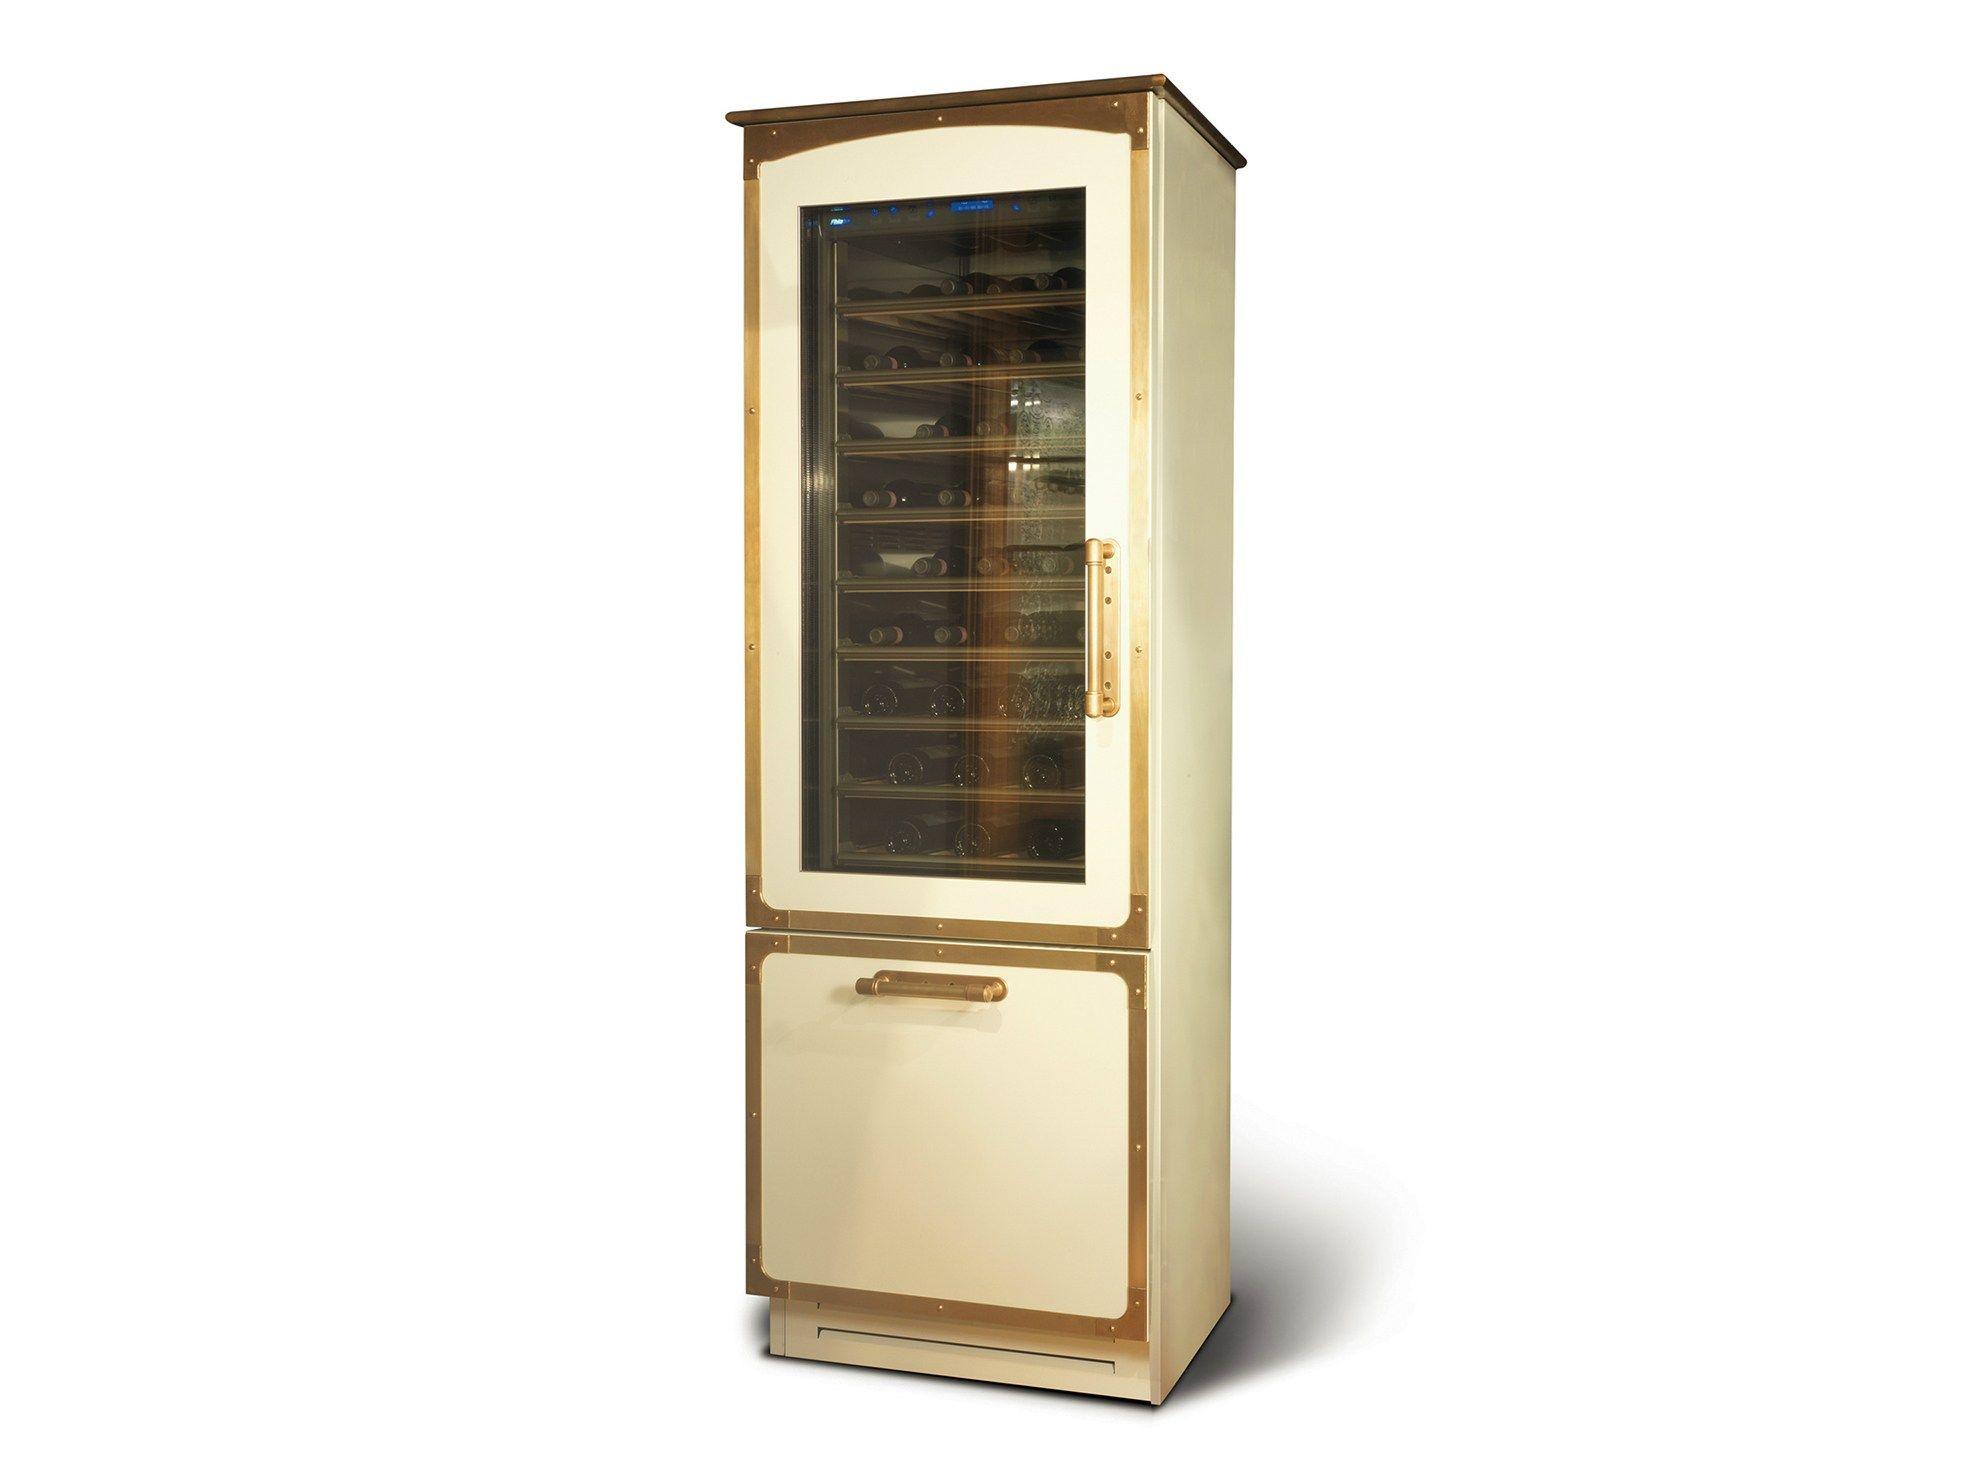 Ogk75 cantinetta frigo by officine gullo for Cantinetta frigo